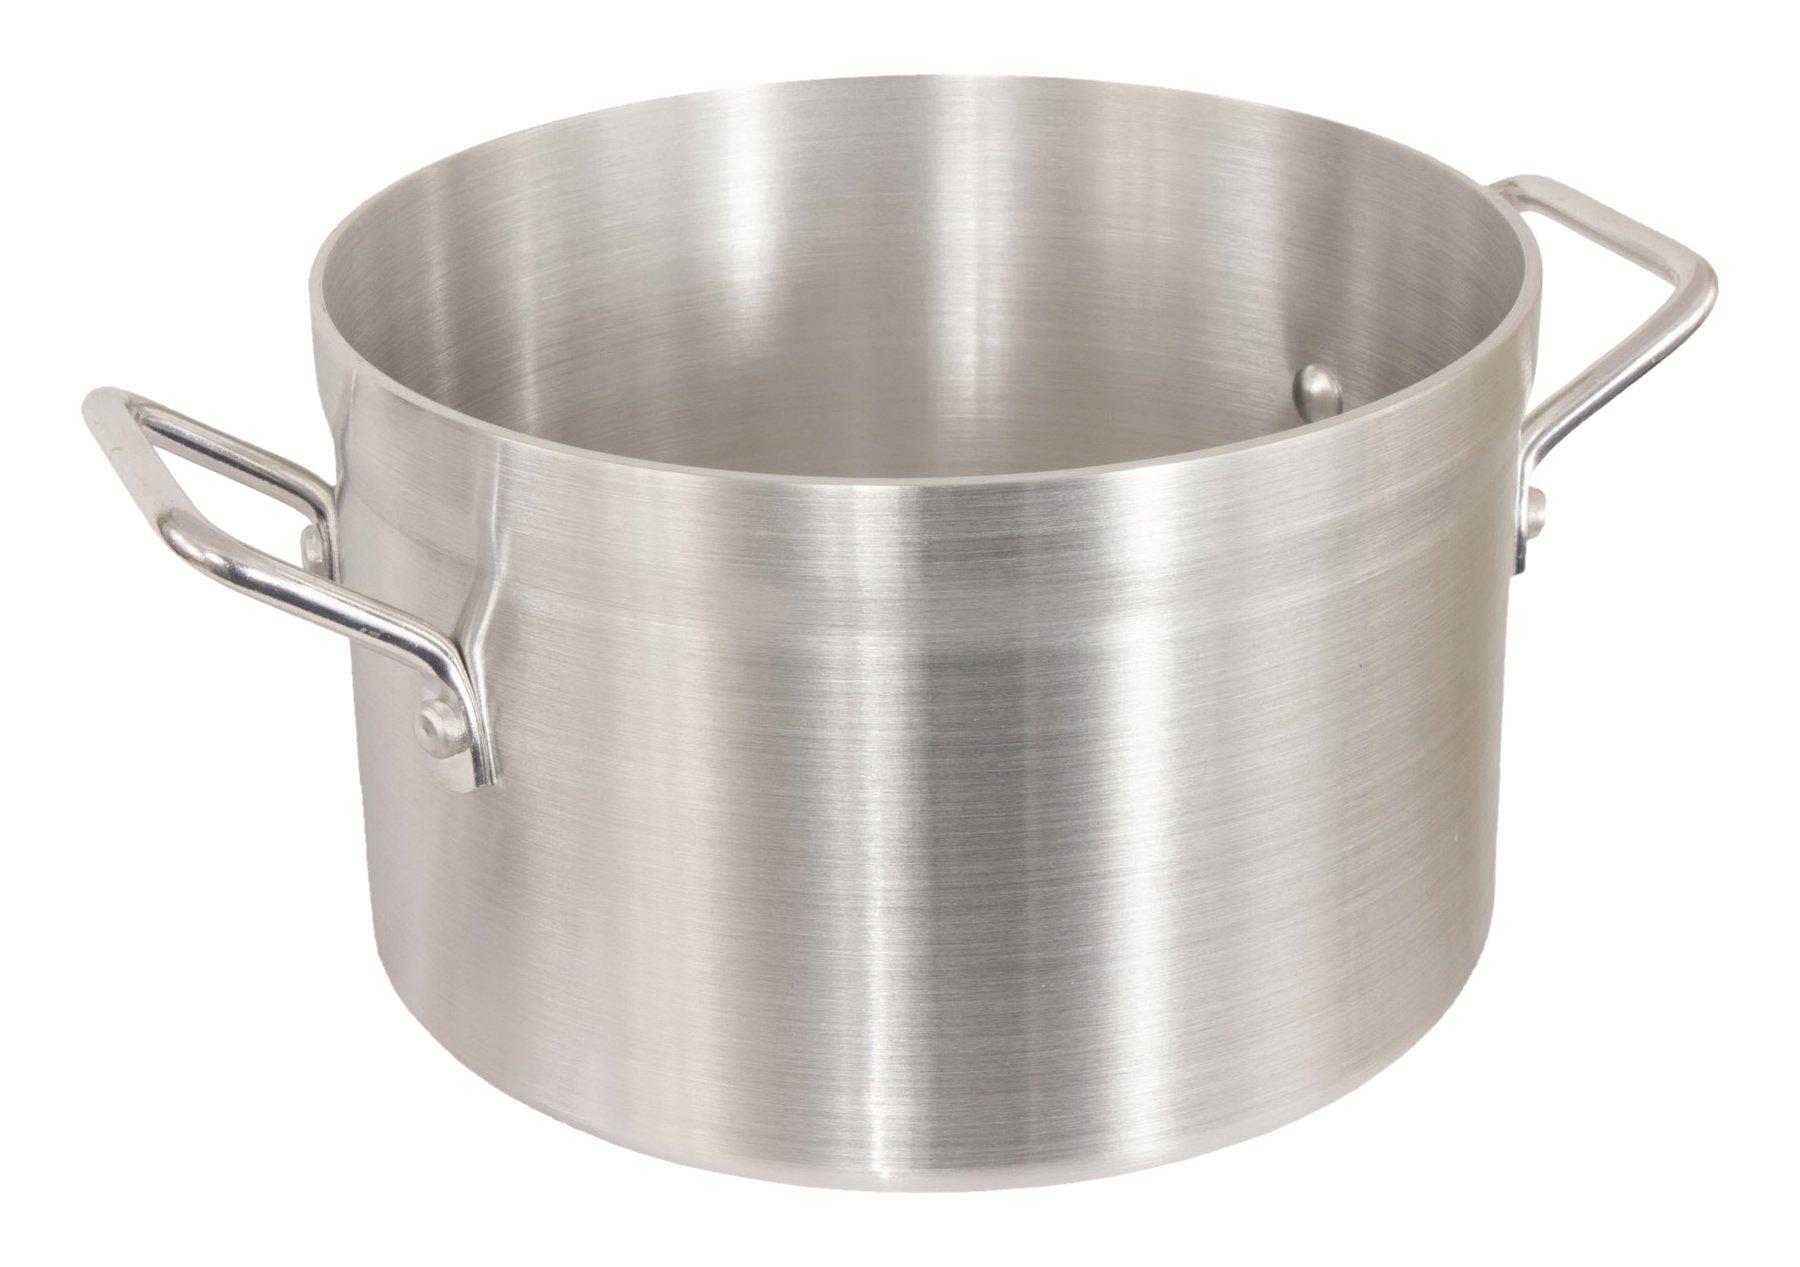 Crestware SAU18 Saucepot, 18 quart, Silver